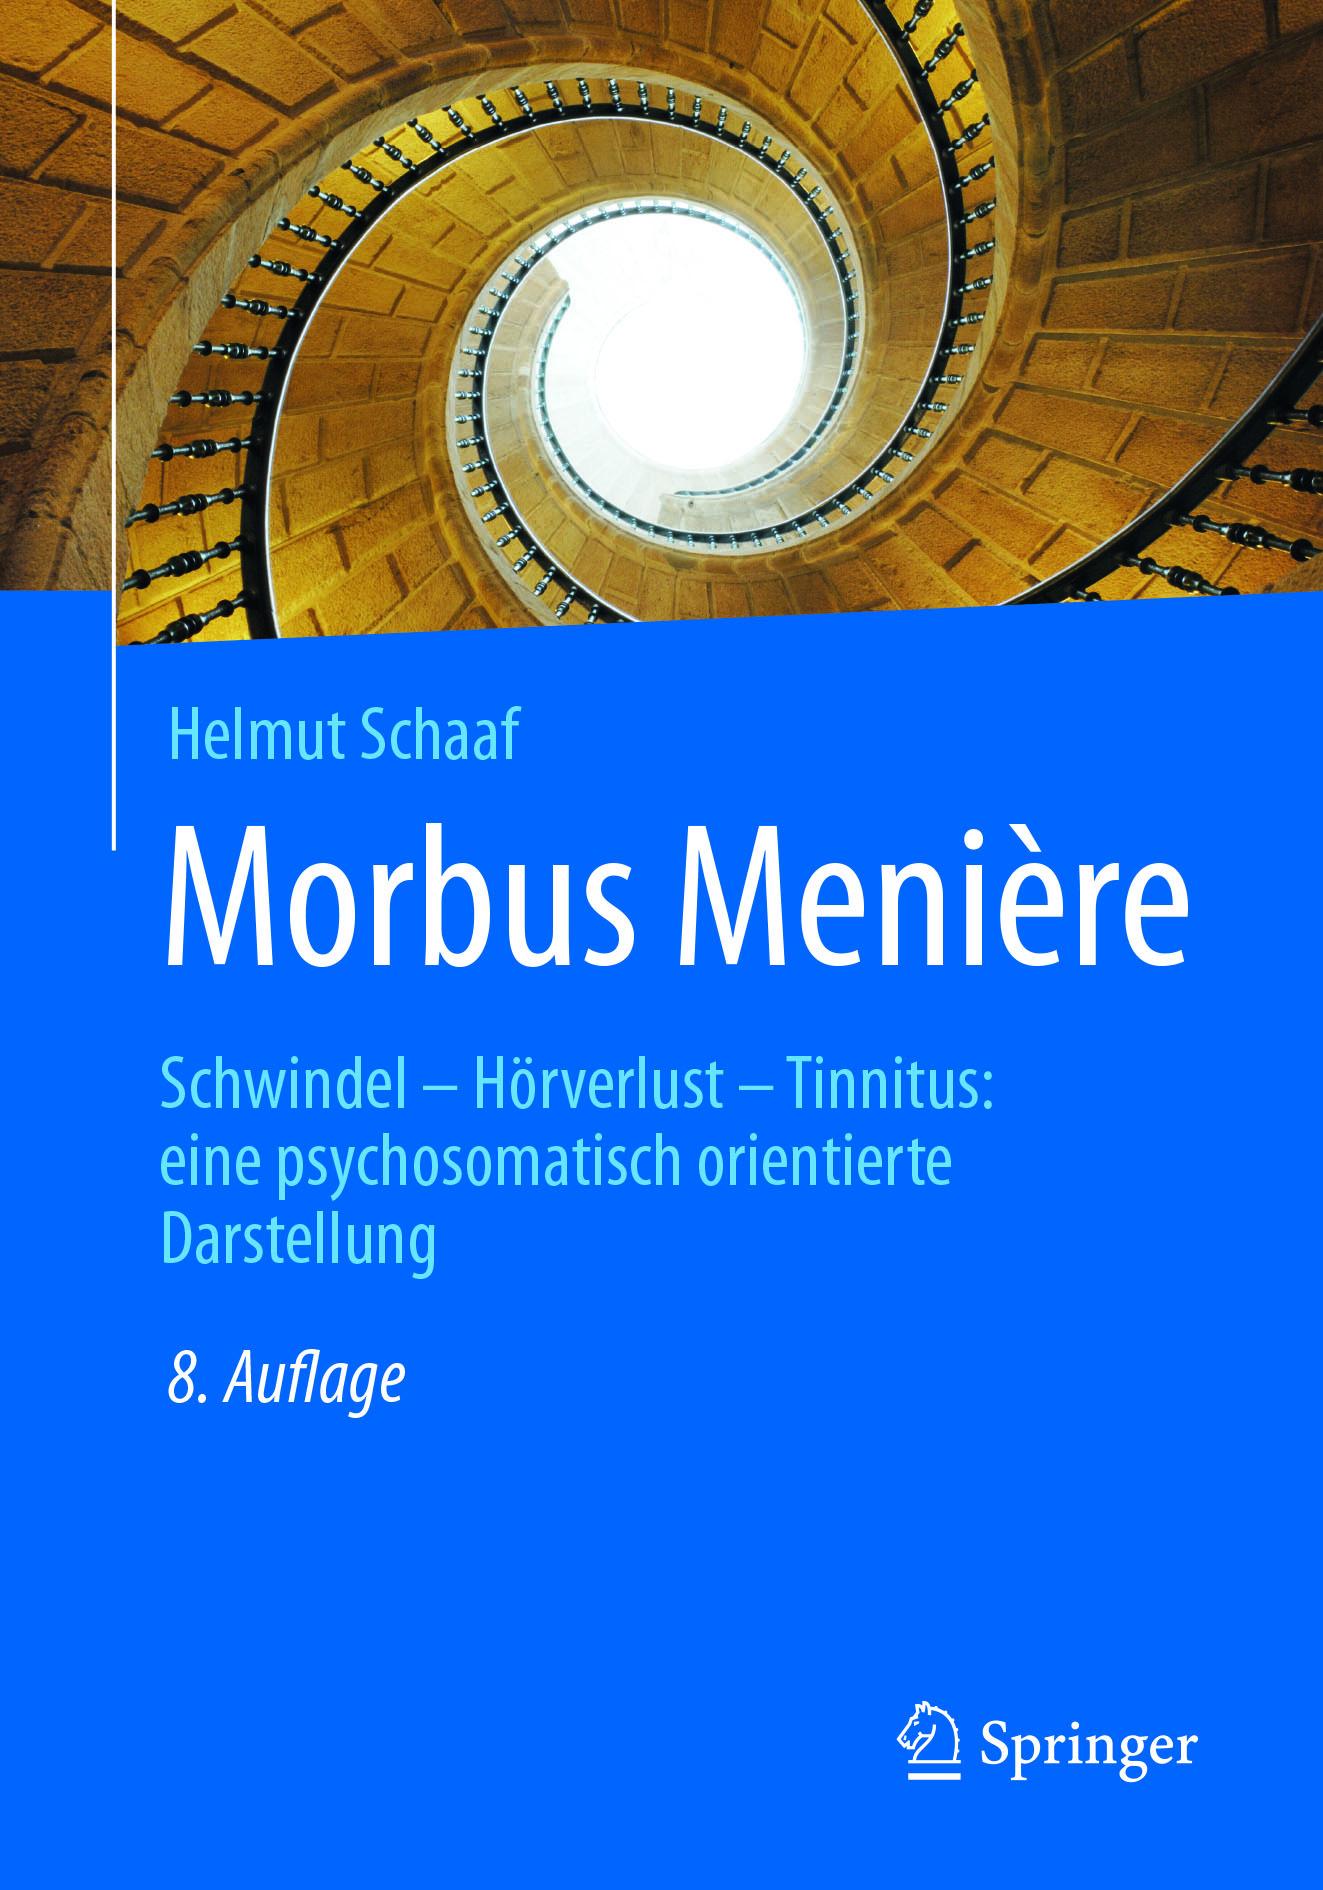 Schaaf, Helmut - Morbus Menière, ebook